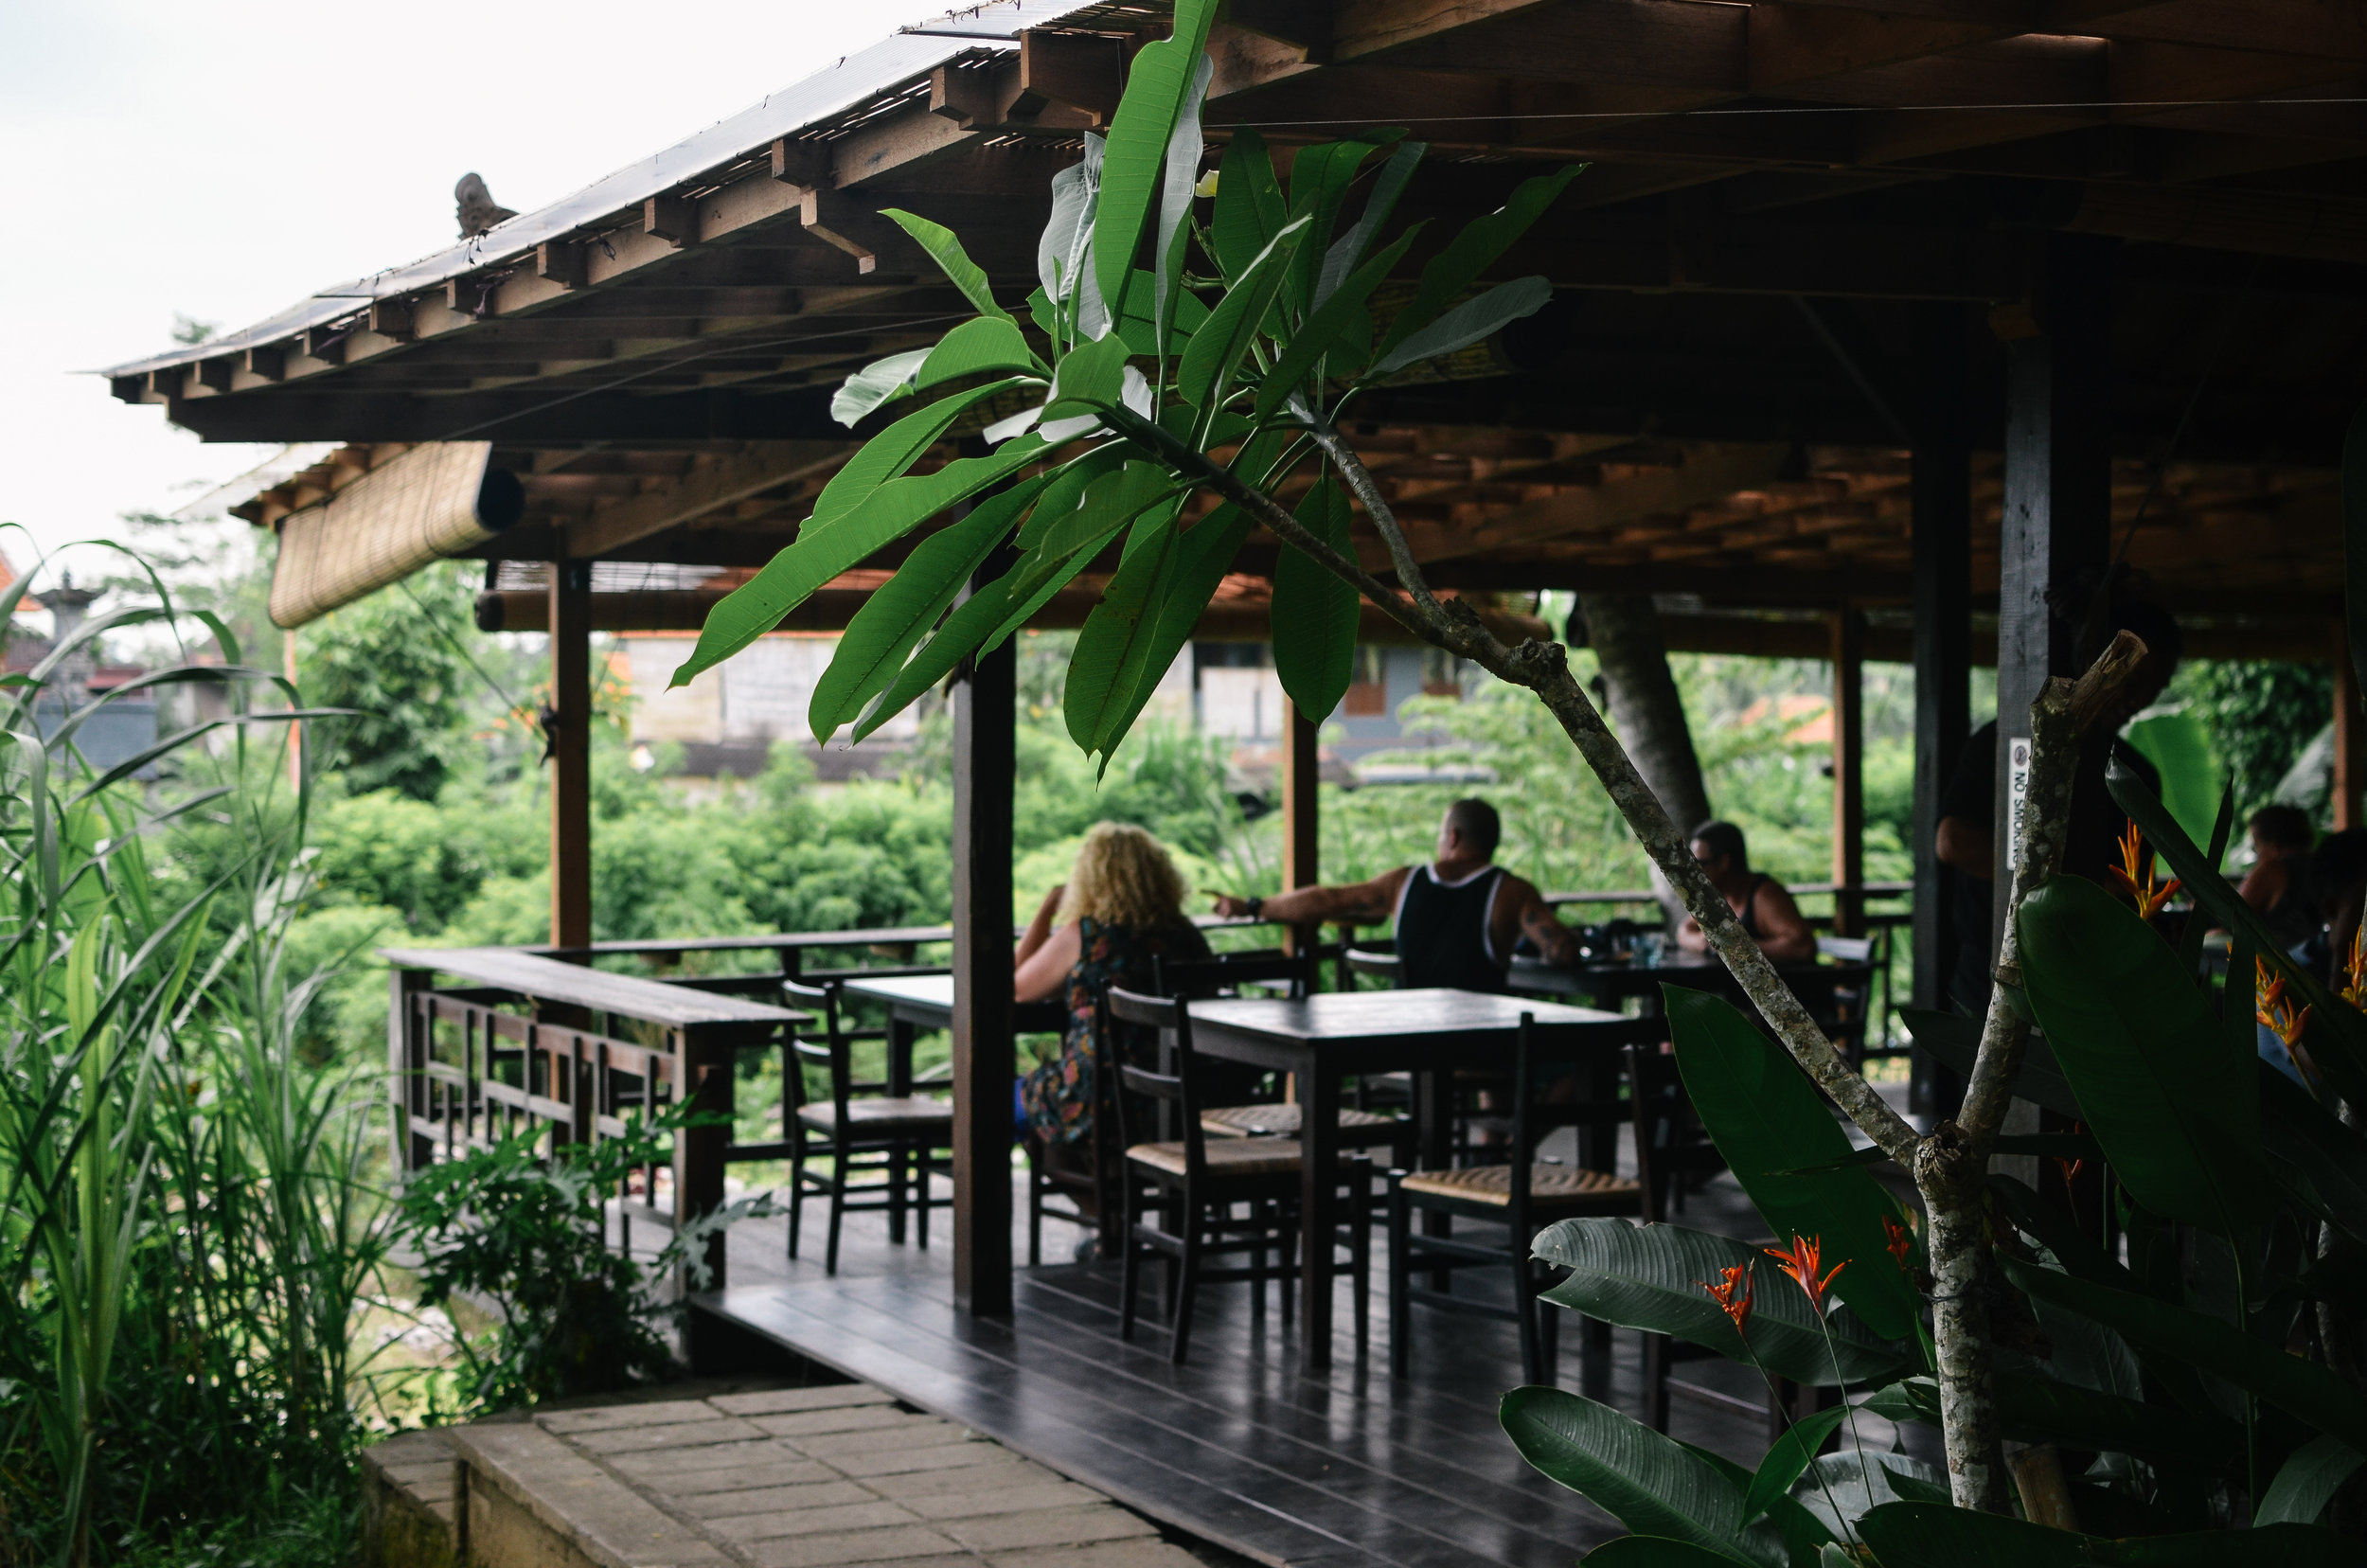 bali+mosca+bamboo+lodge+bali+ubud+lifeonpine_DSC_2735.jpg